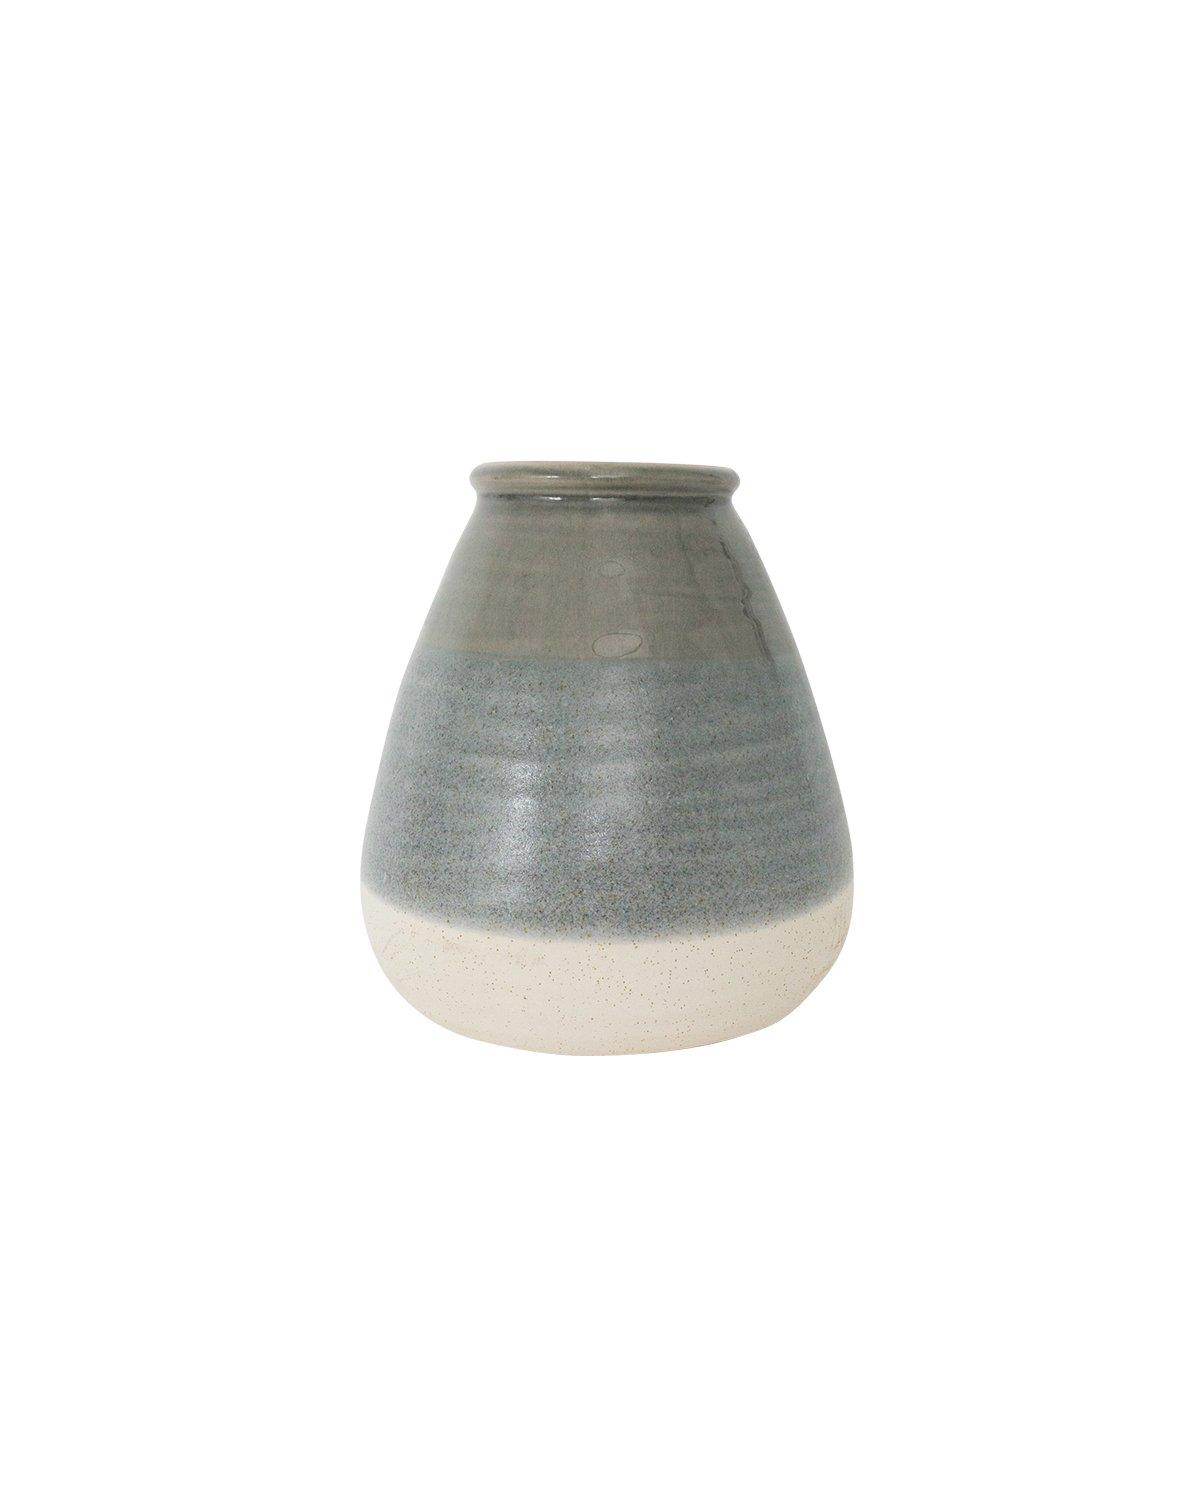 Cone_Vase2.jpg